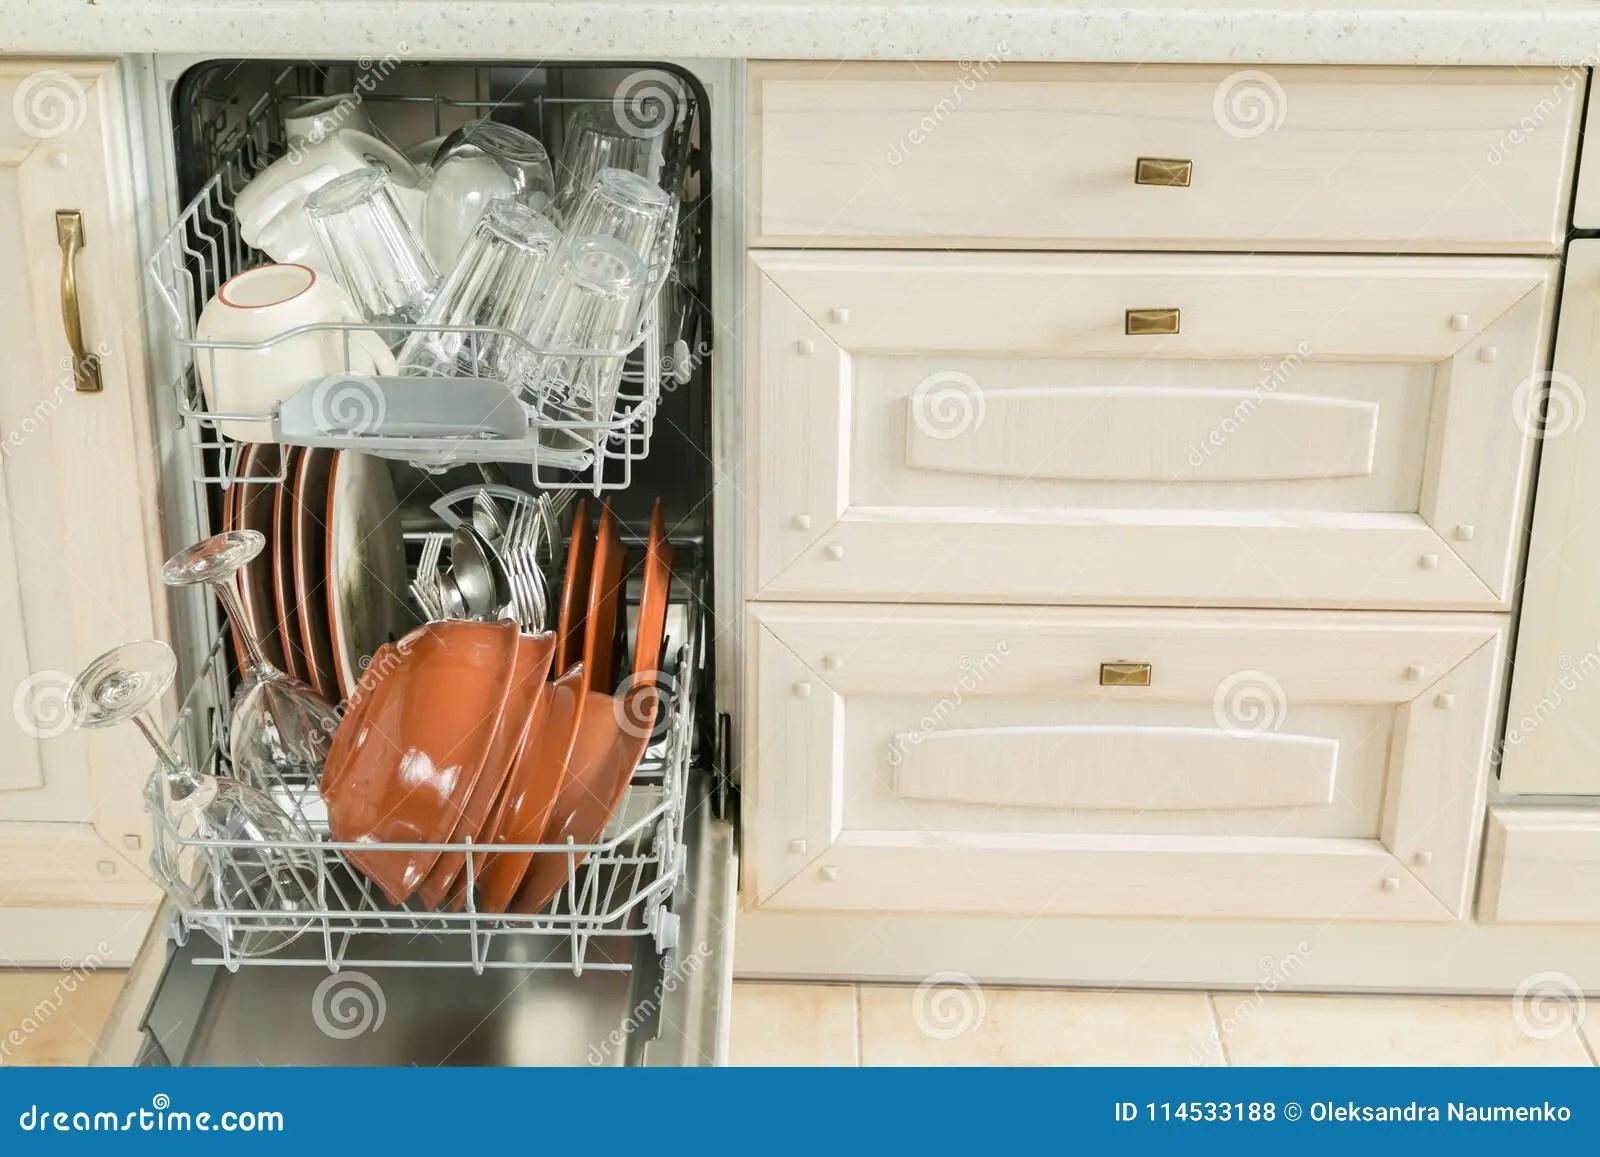 kitchen dishwashers wolf design 充分洗碗机有干净的盘的在厨房背景中库存照片 图片包括有扁平的餐具 充分洗碗机有干净的盘的在厨房背景 拷贝空间中